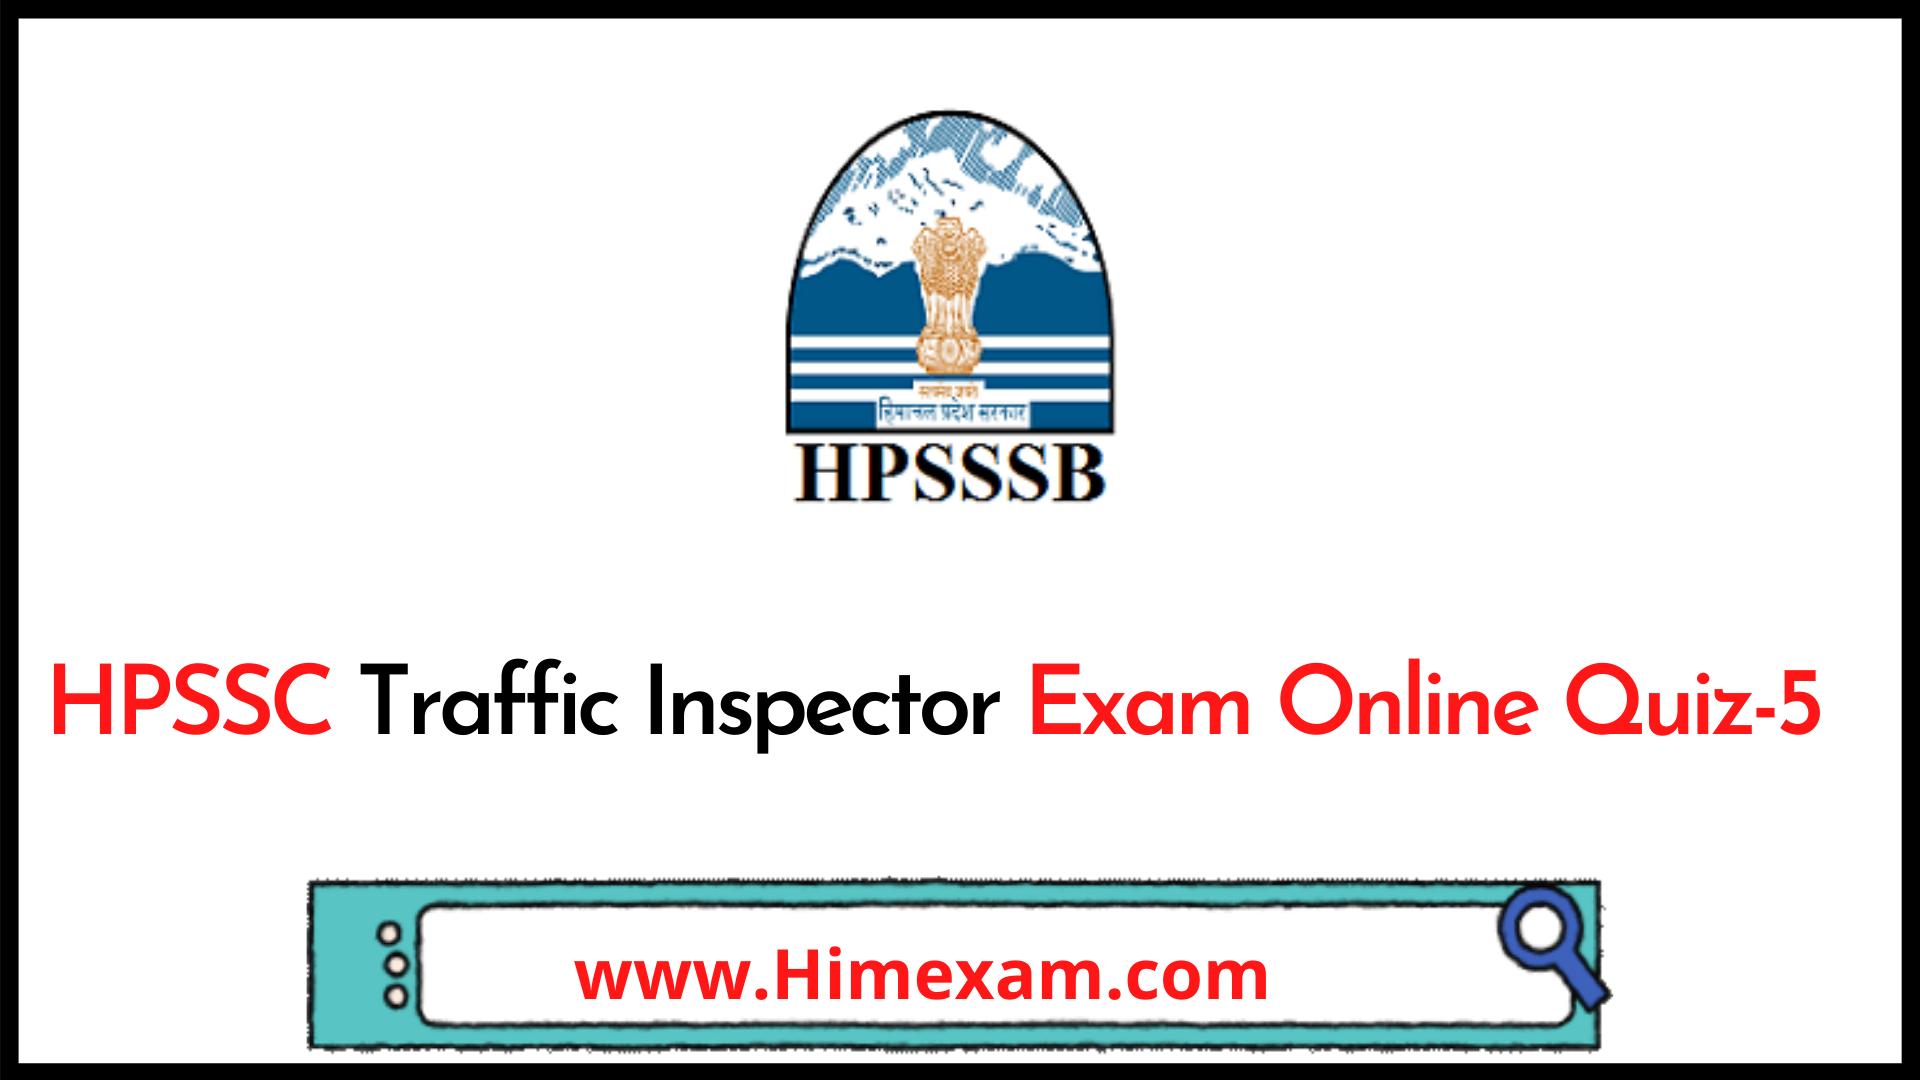 HPSSC Traffic Inspector Exam Online Quiz-5